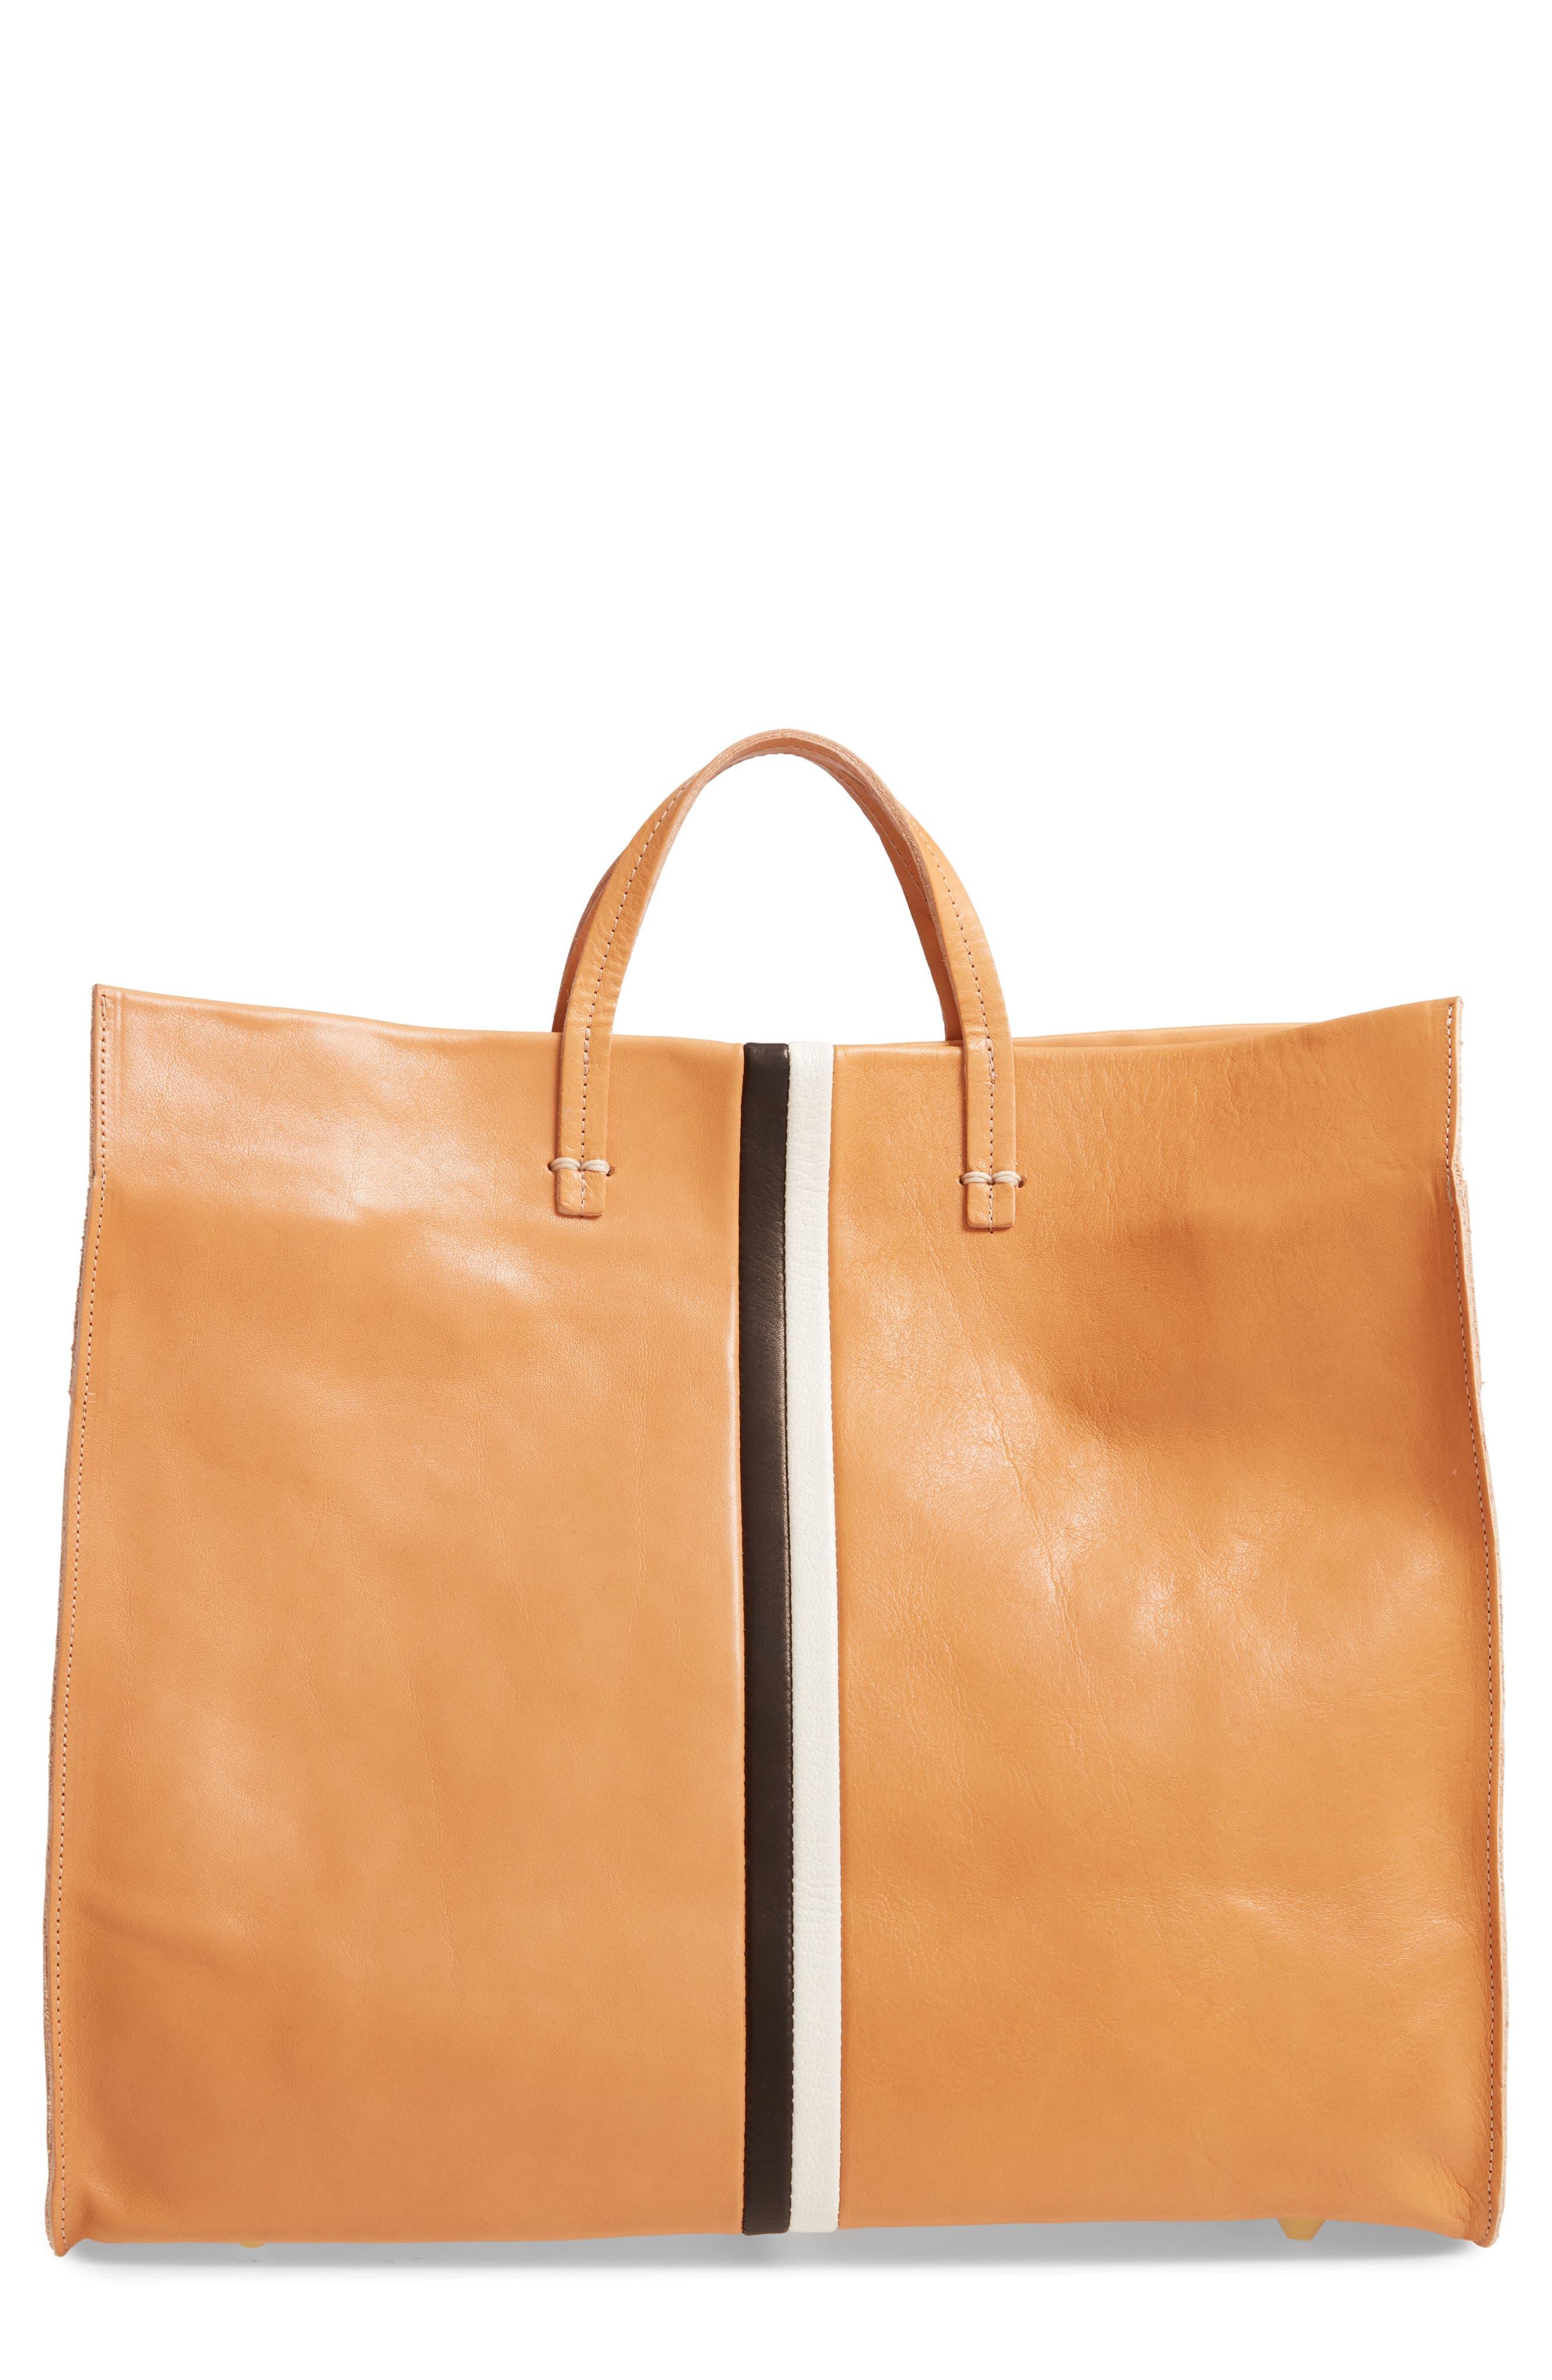 Simple Stripe Leather Tote, Main, color, 200